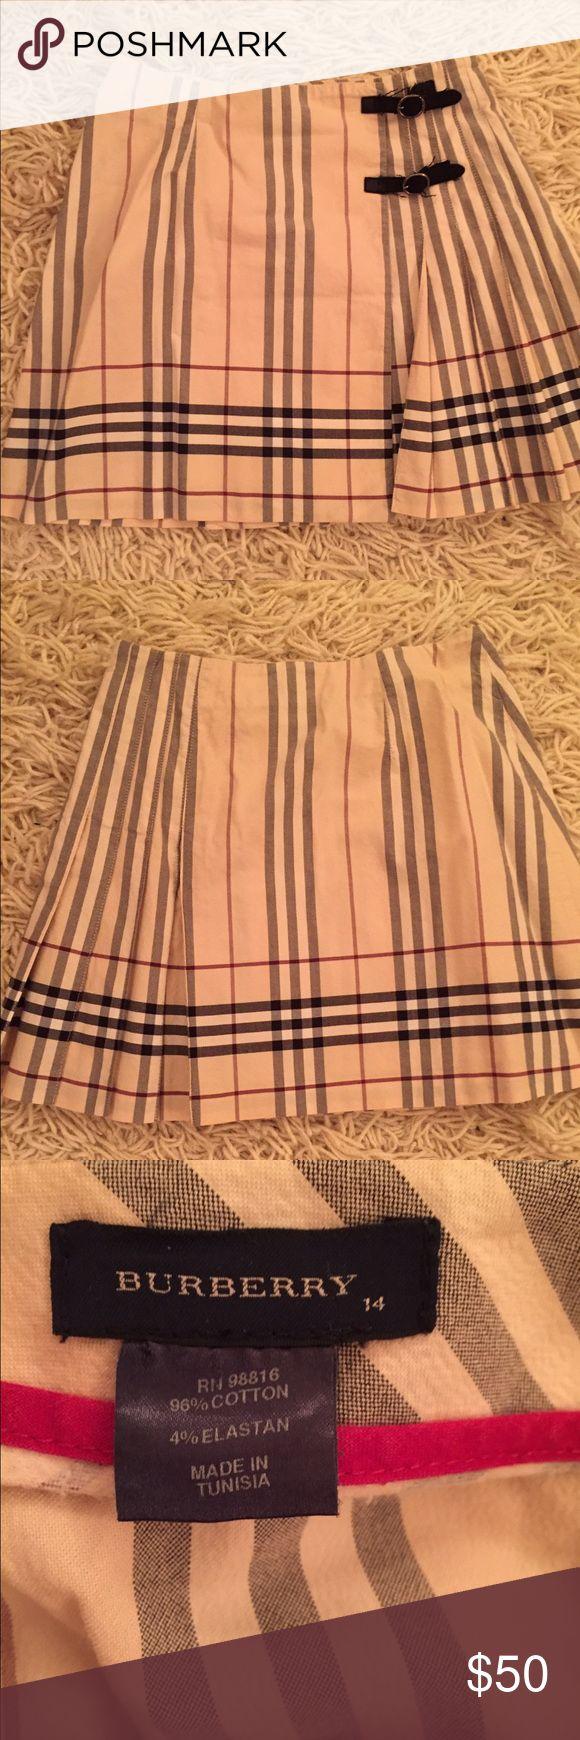 Burberry skirt Classic Burberry plaid skirt that wraps around form the back Burberry Skirts Mini